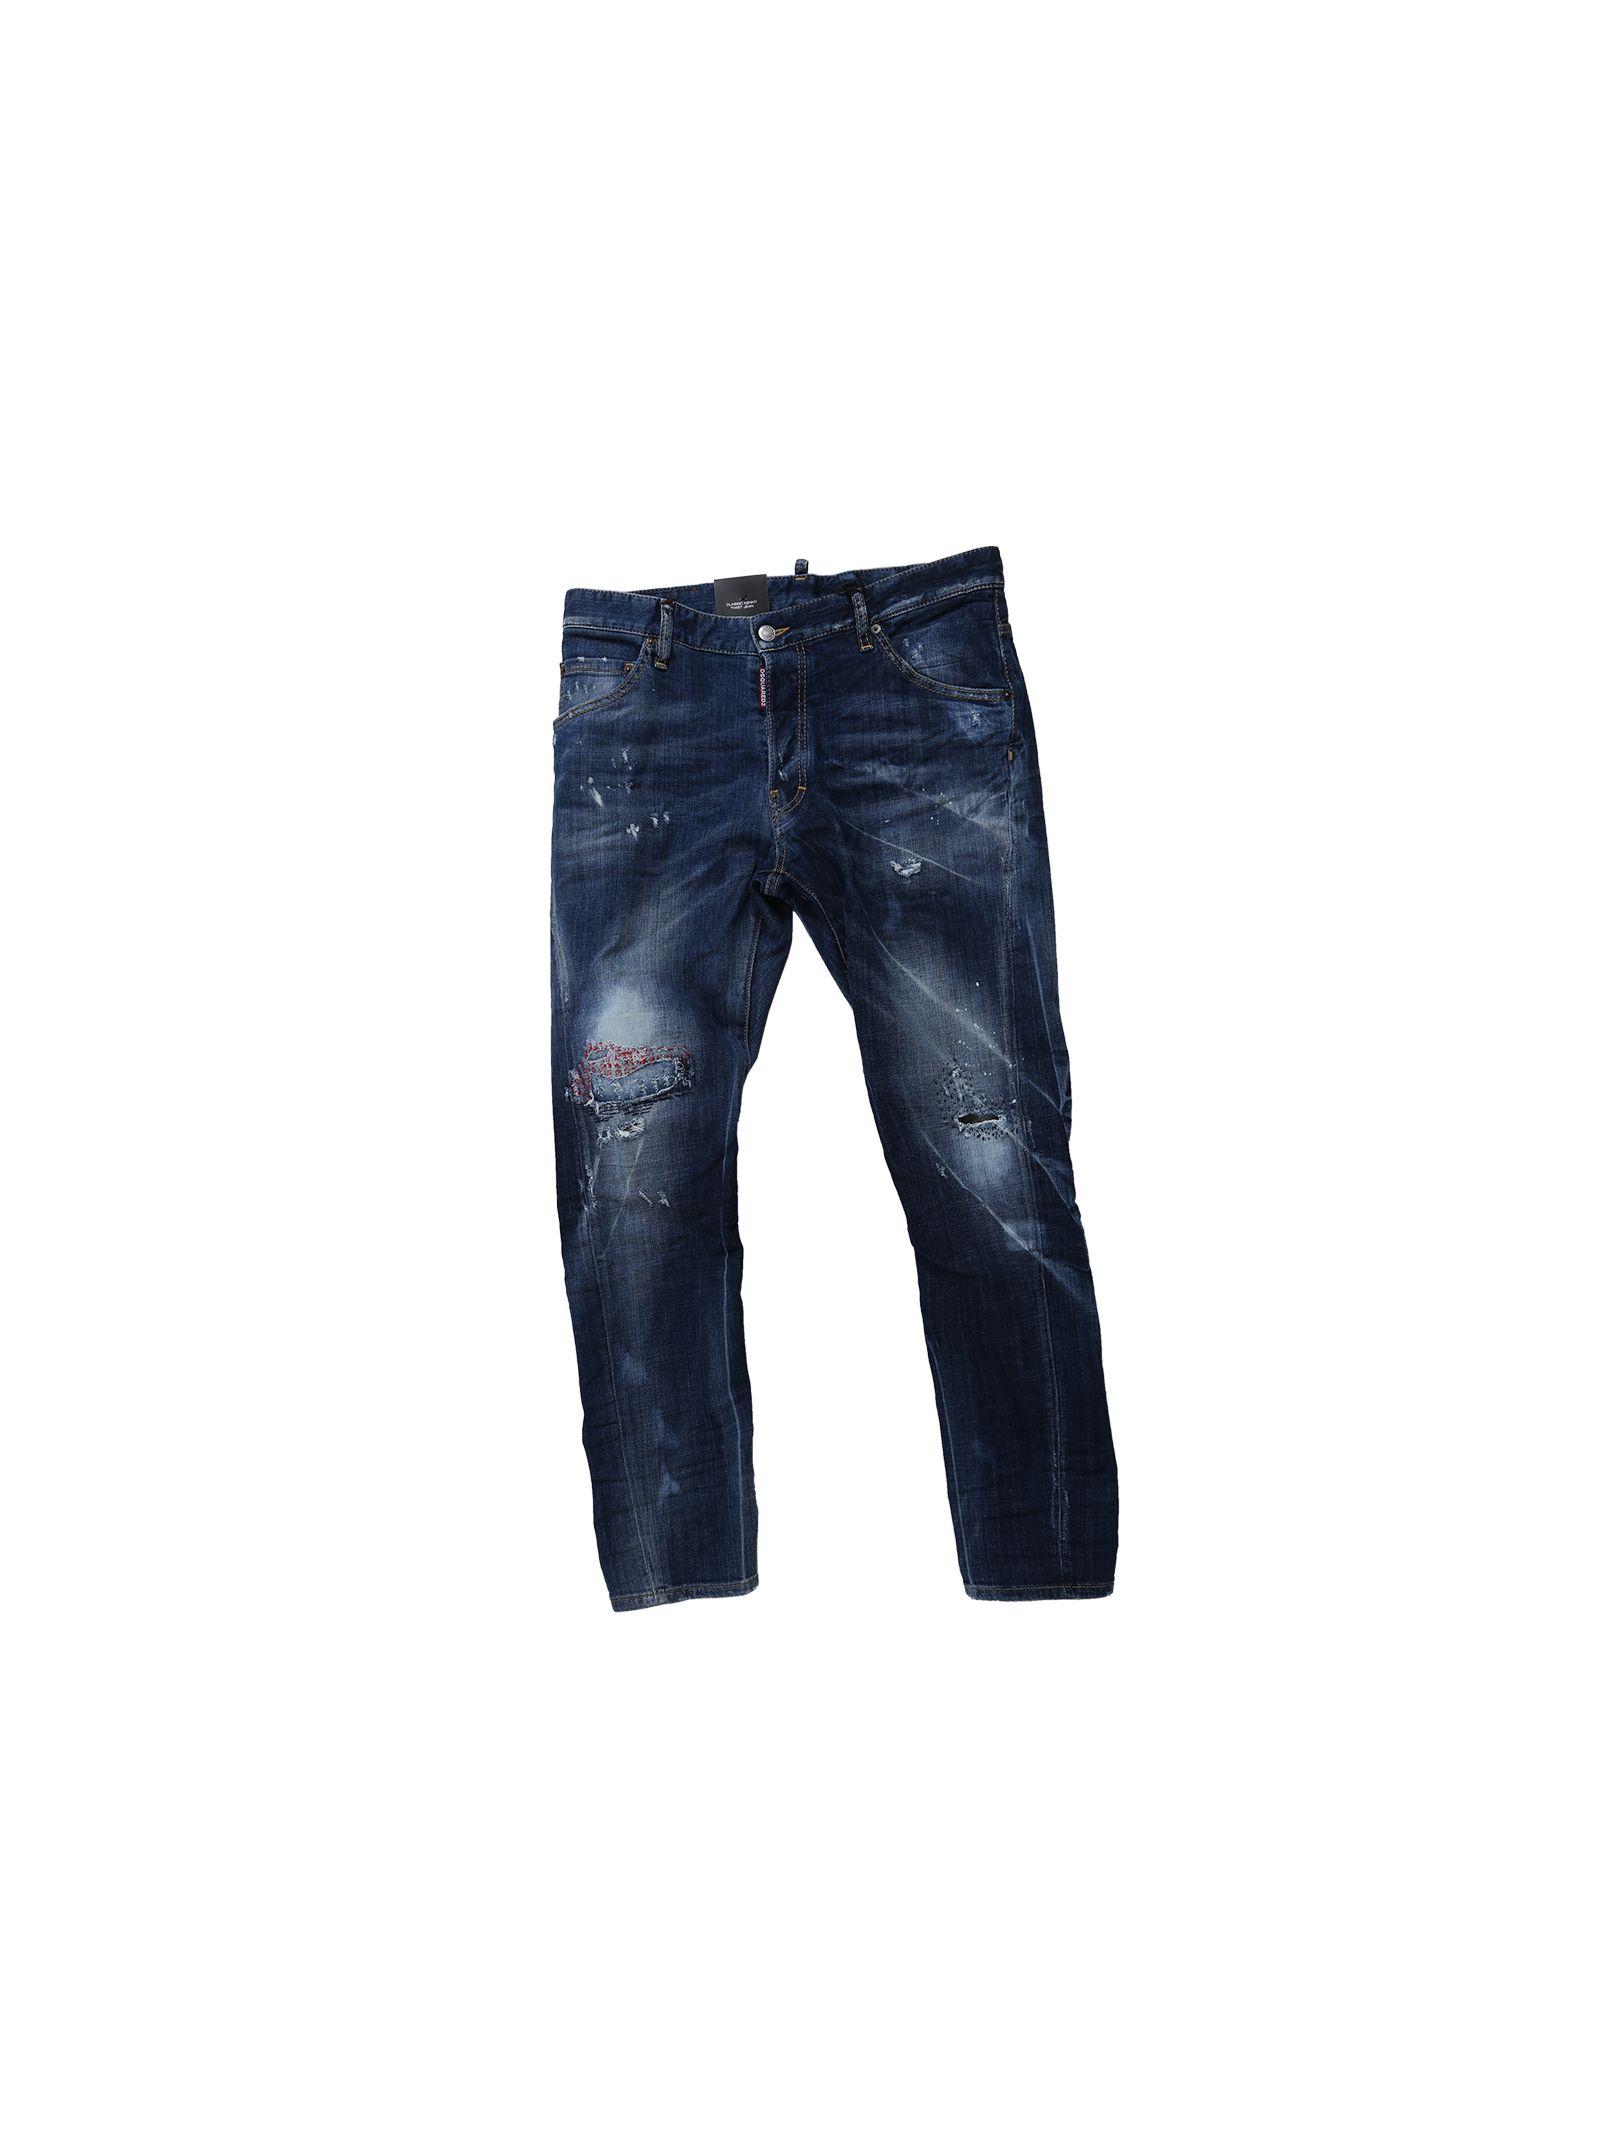 Washed Blue Denim Kenny Twist Jeans